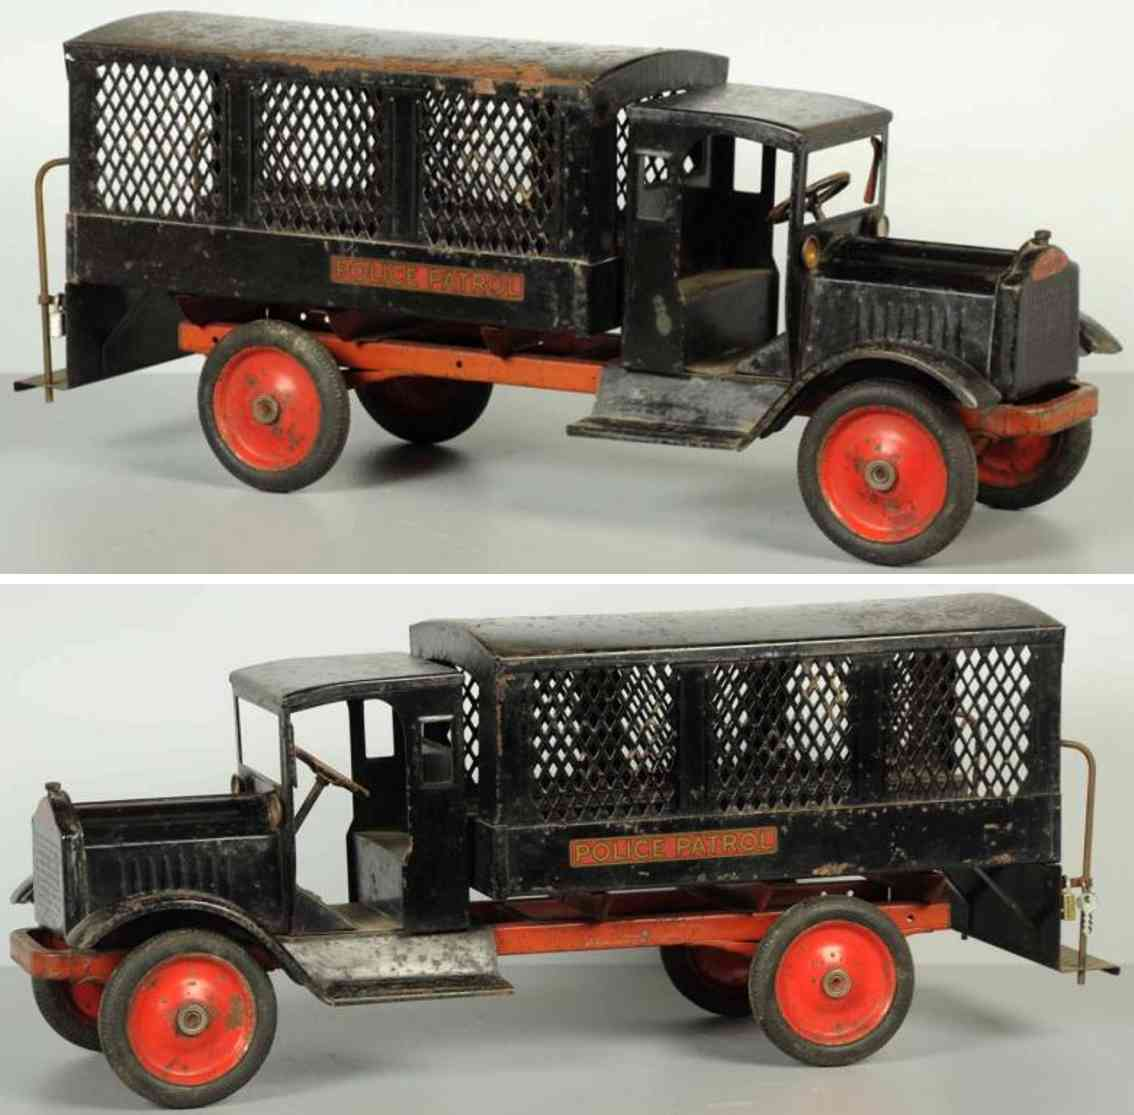 keystone stahlblech spielzeug poilzeistreifenwagen